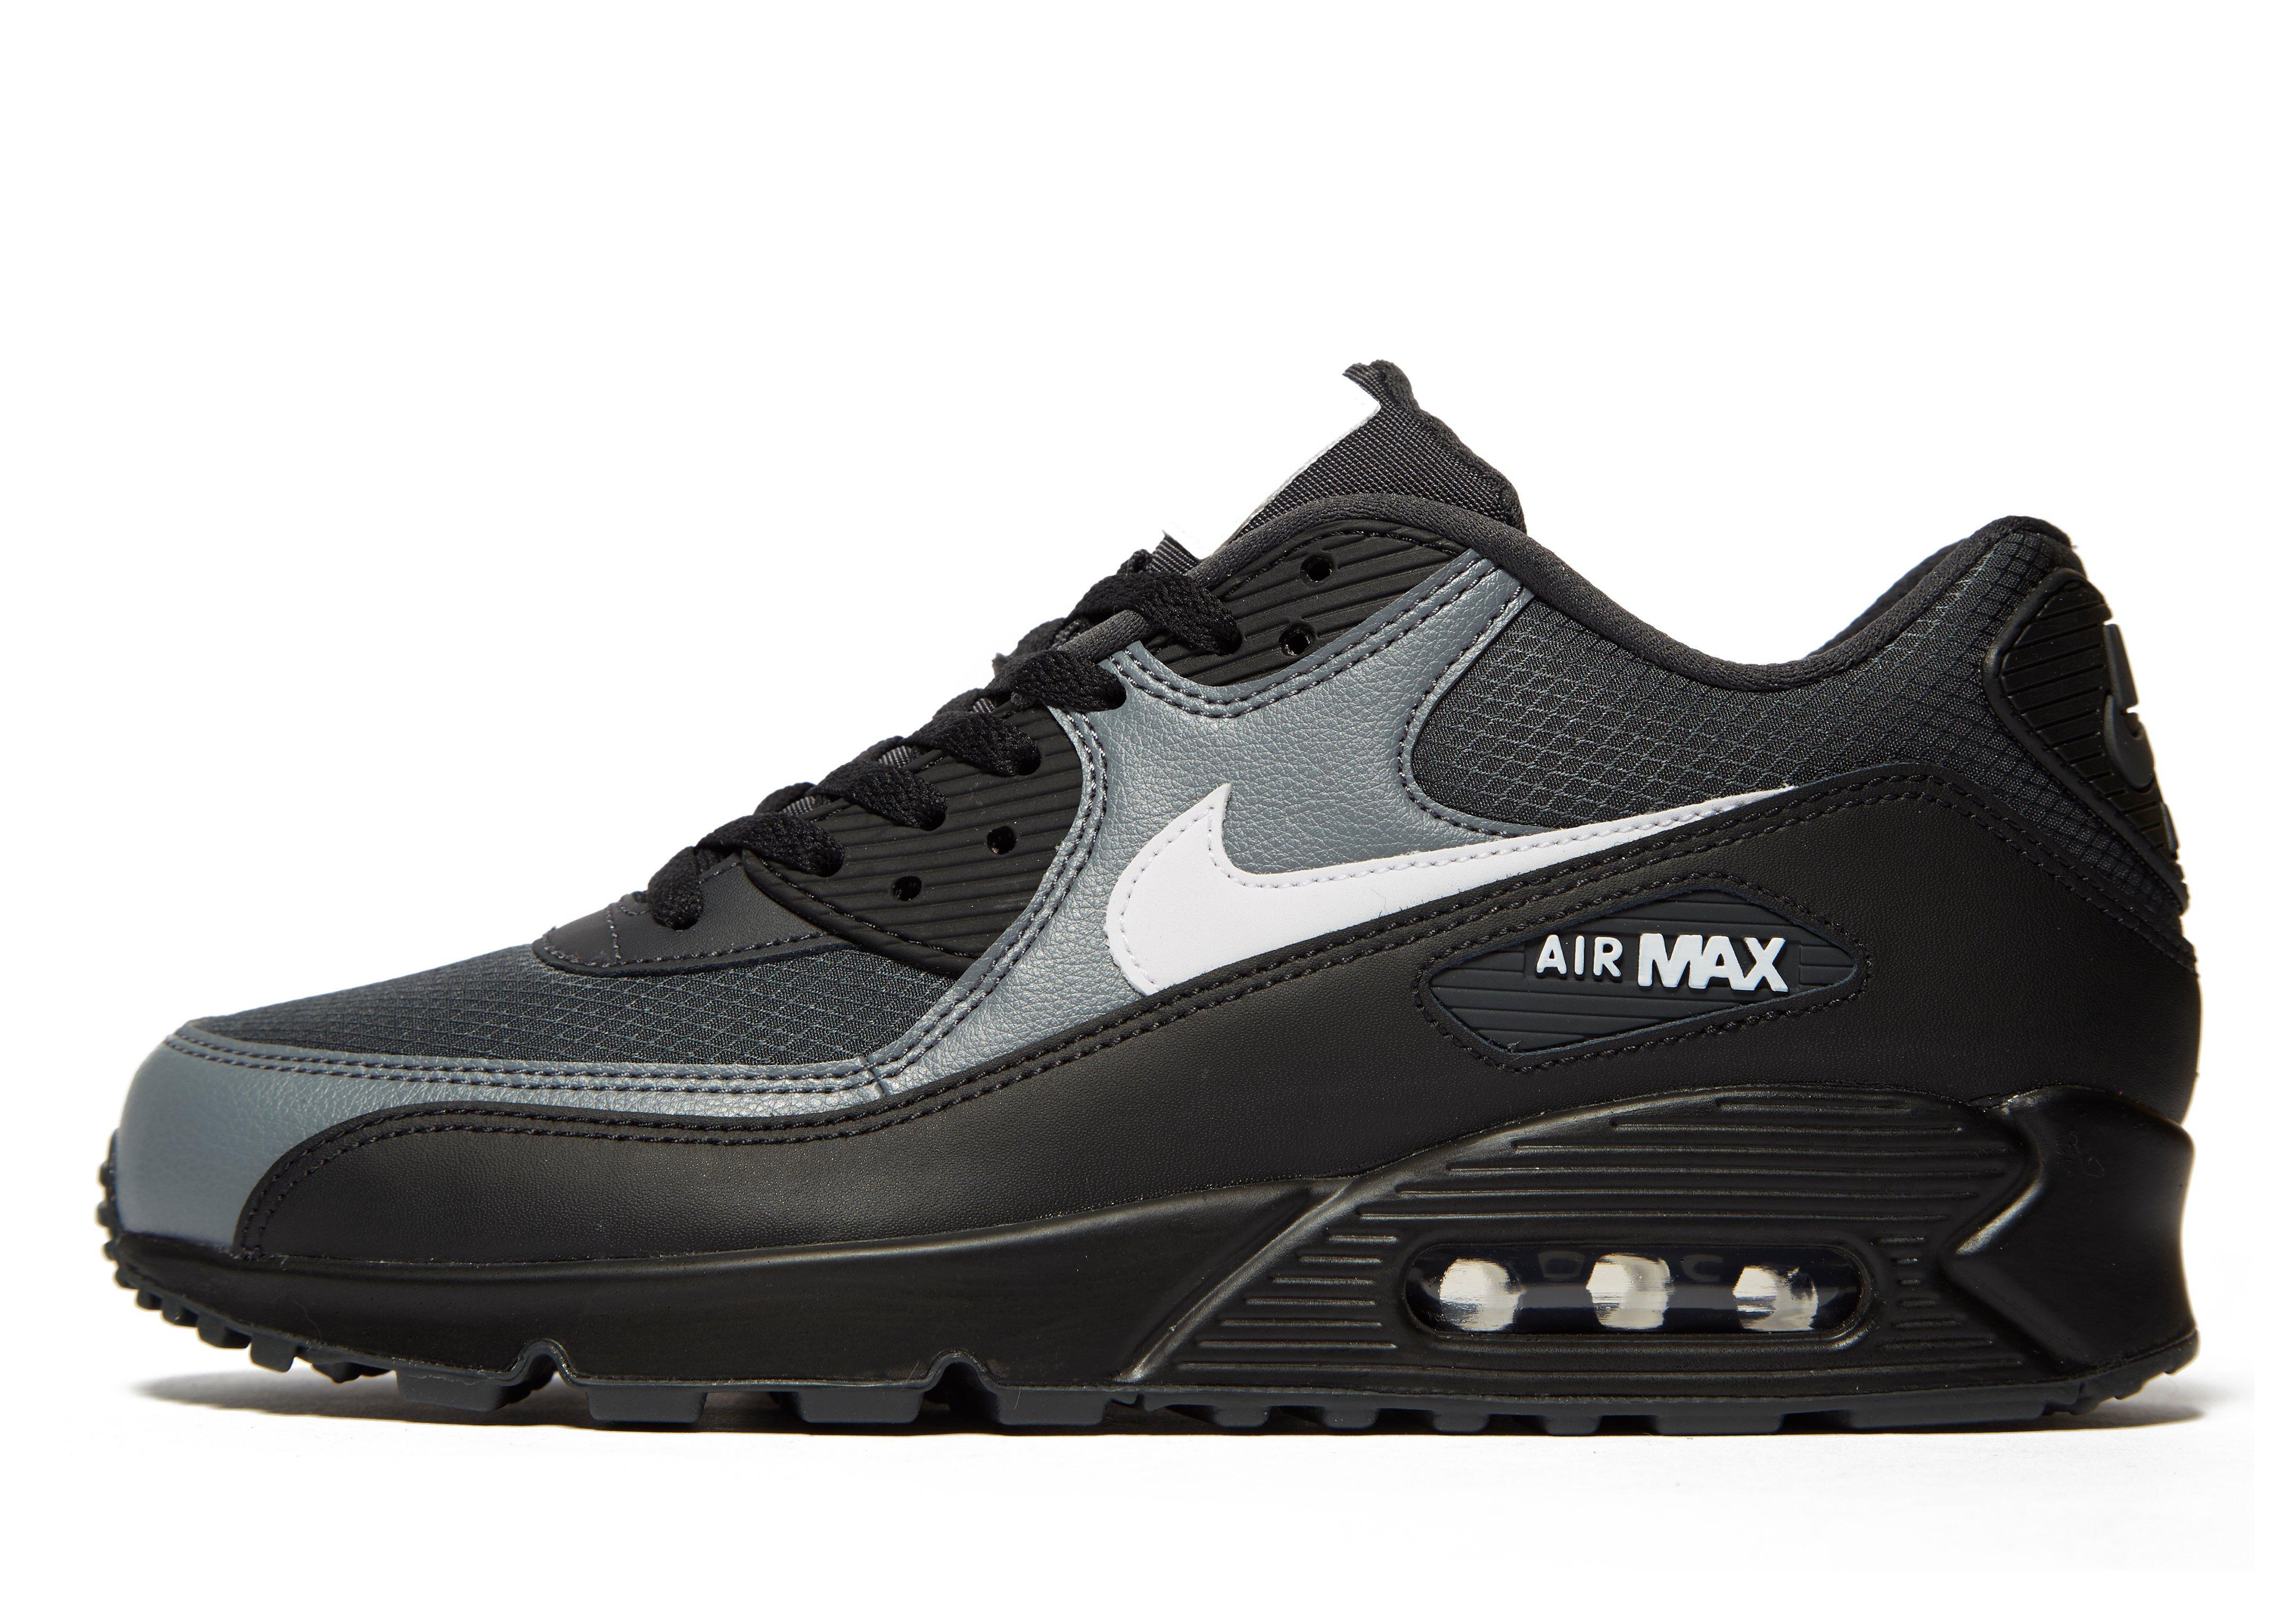 sale retailer a90d2 6c37d ... lebron 11 for 50 dollars Nike Air Max 90 Essential Leopard Black Gold  Cheap,discount Miami,designer Fashion ...